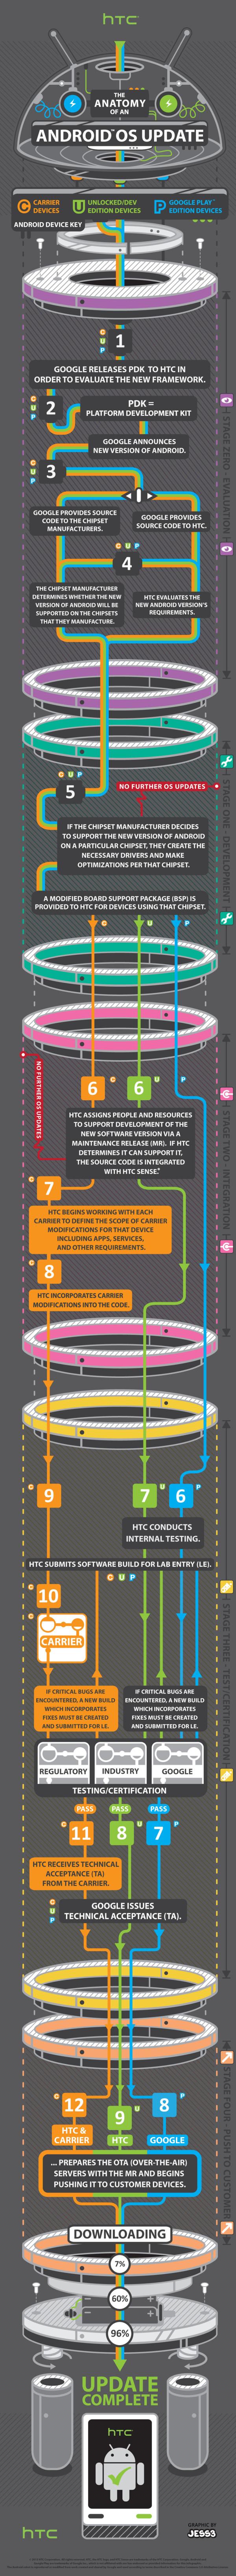 htc-uppdateringar-forklaringar-infographic